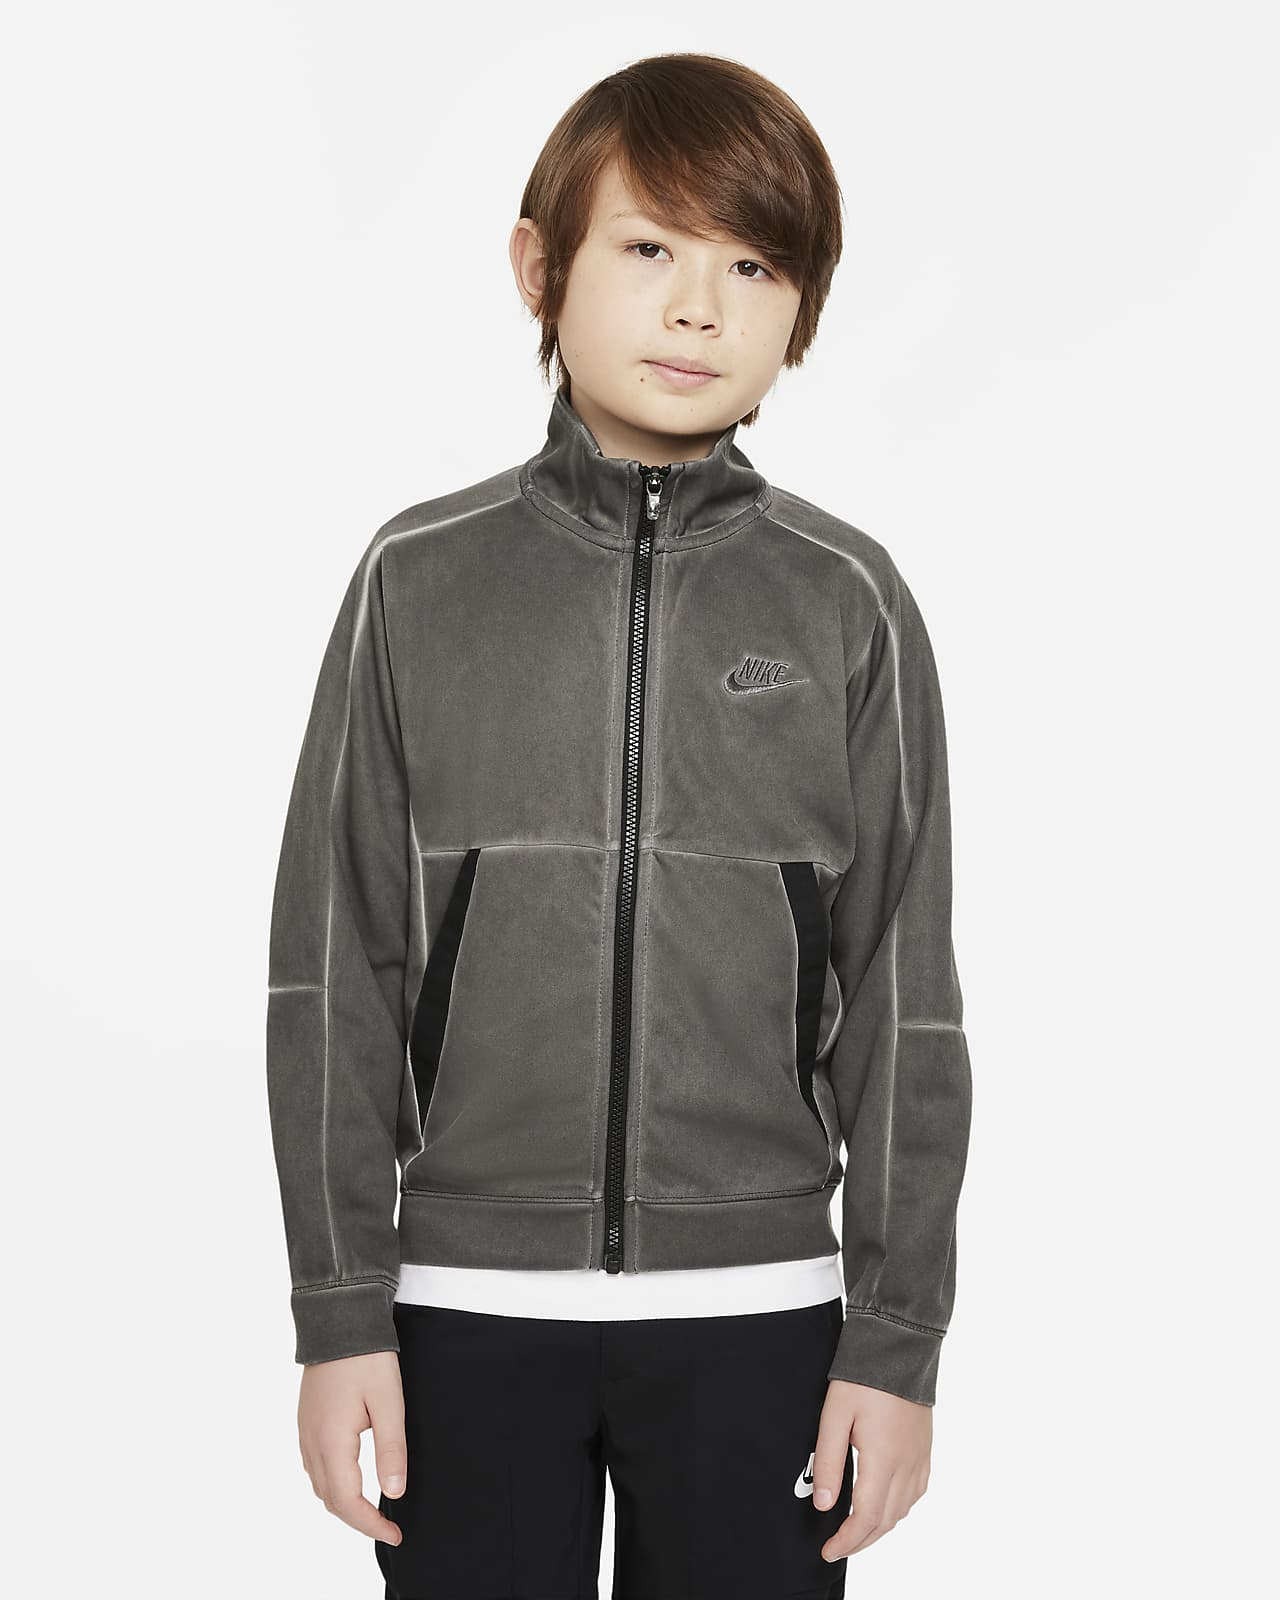 Nike Sportswear Big Kids' Jacket